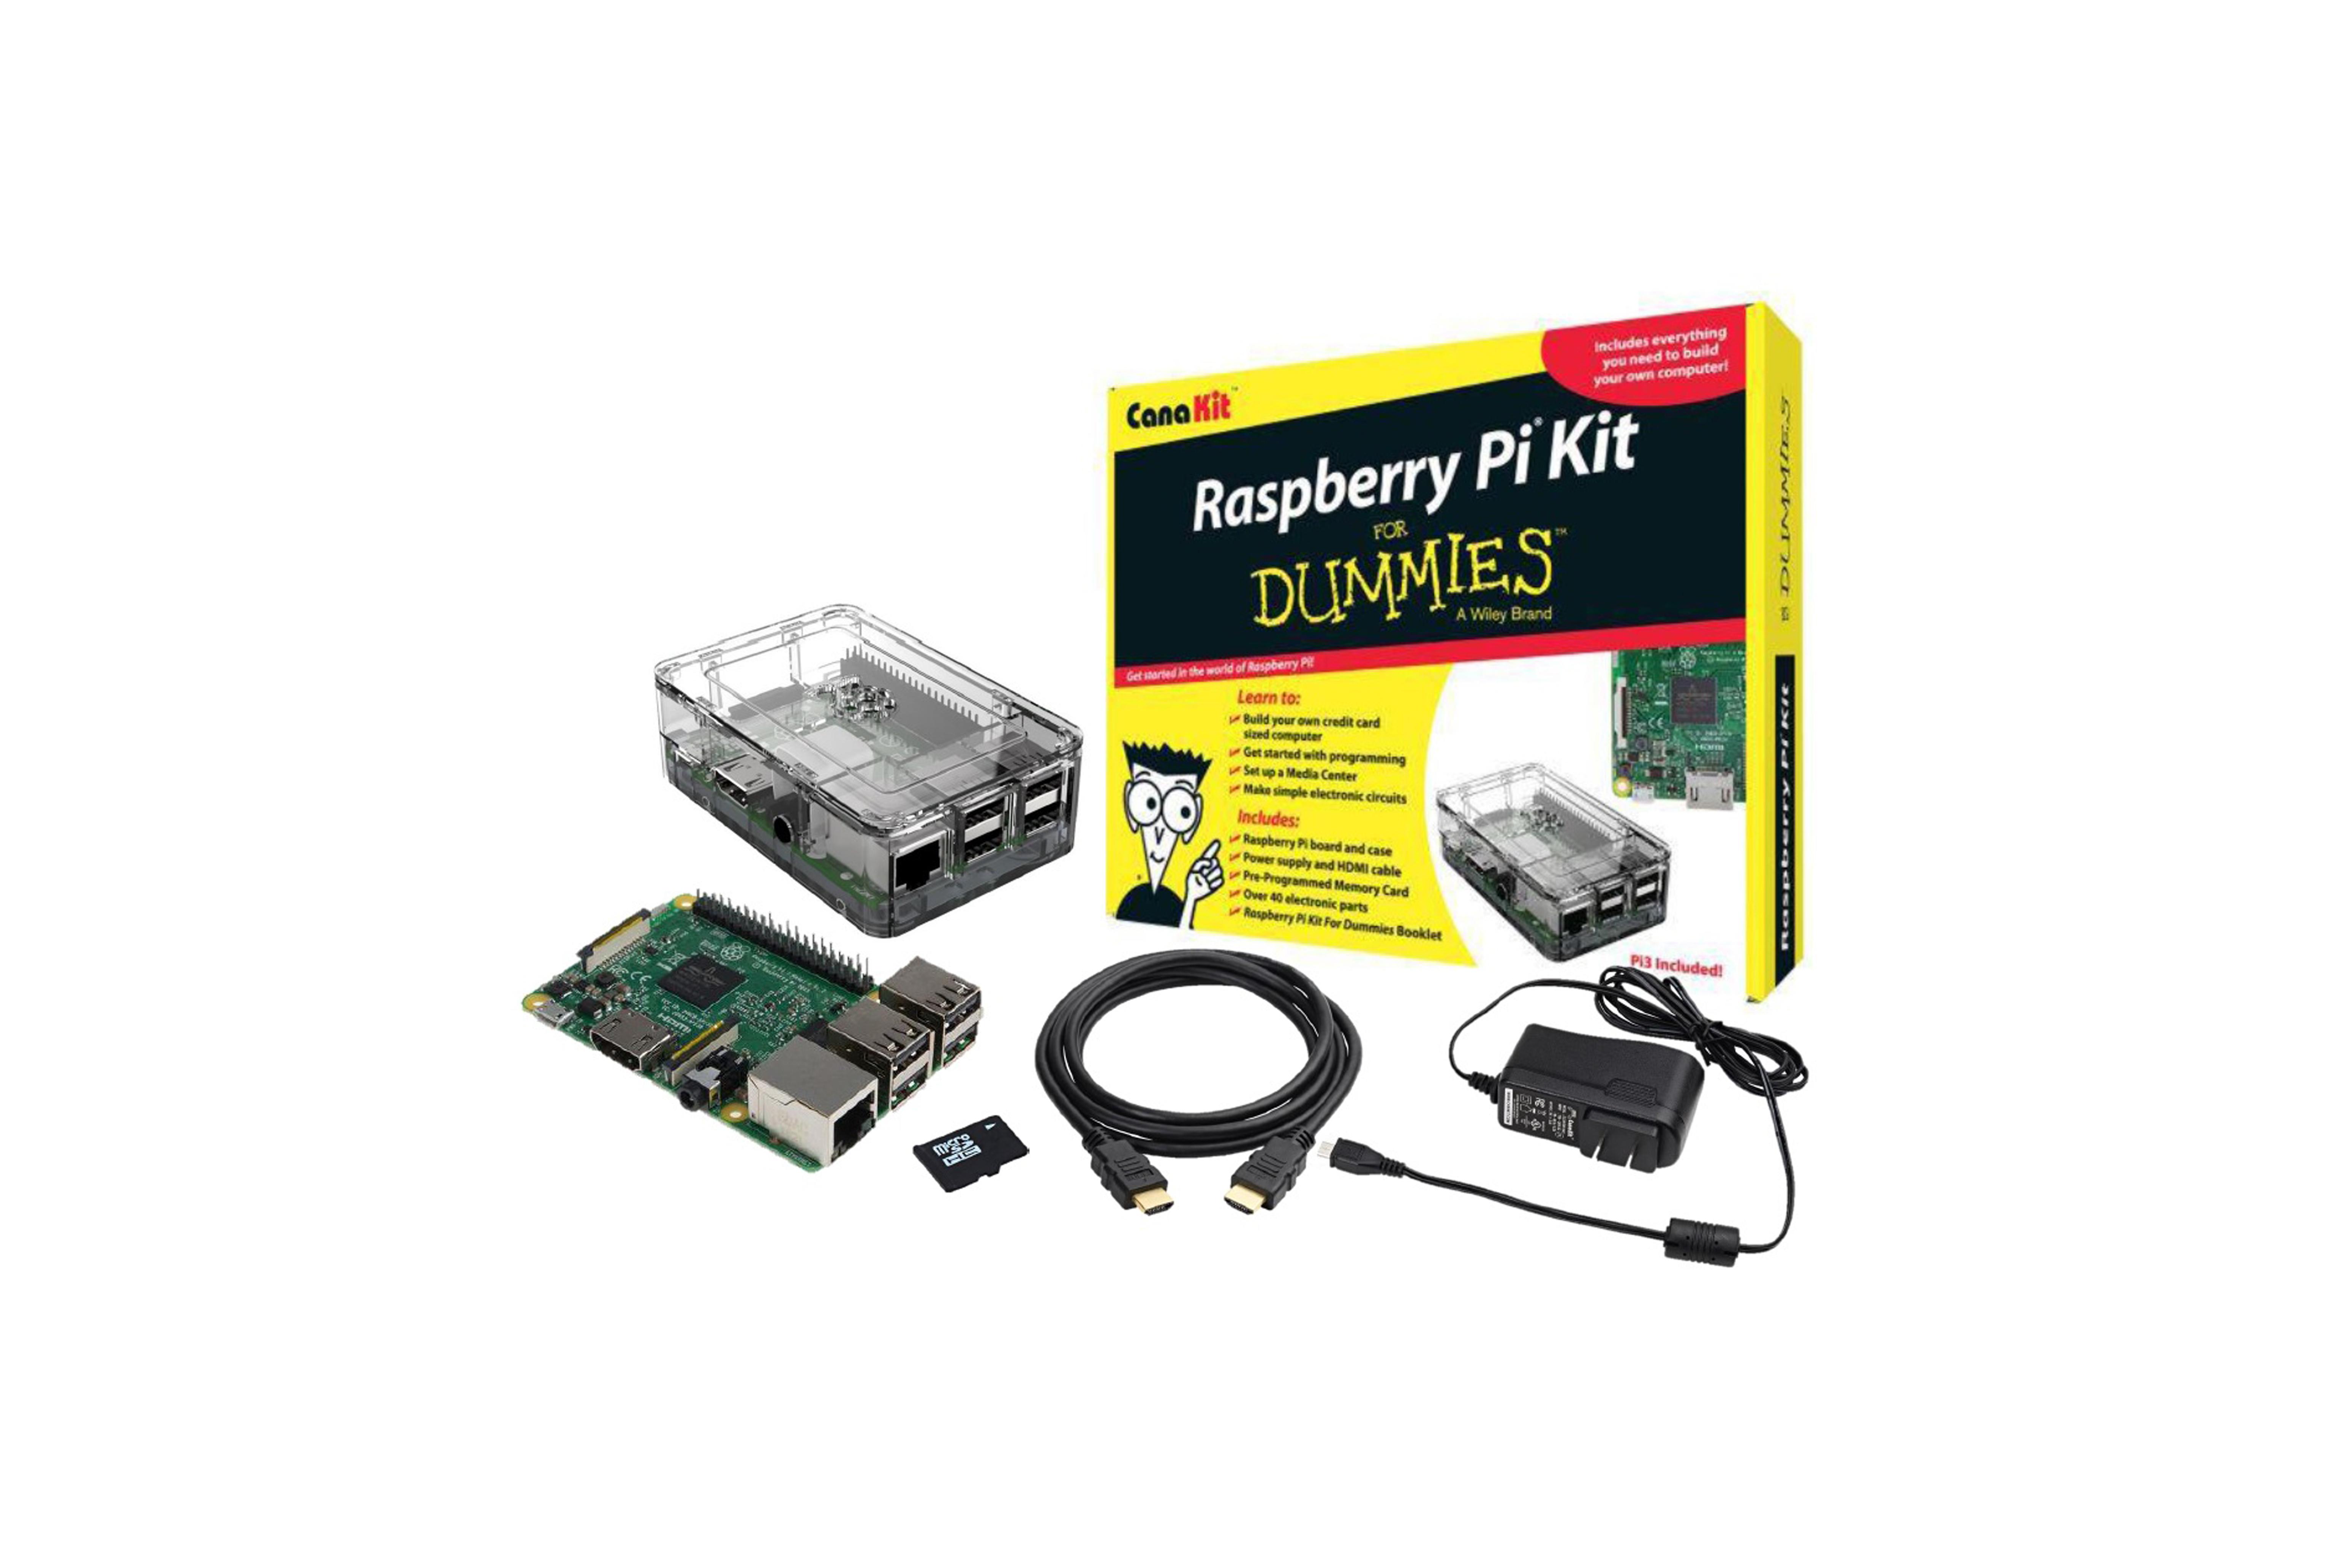 Raspberry Pi Kit per principianti